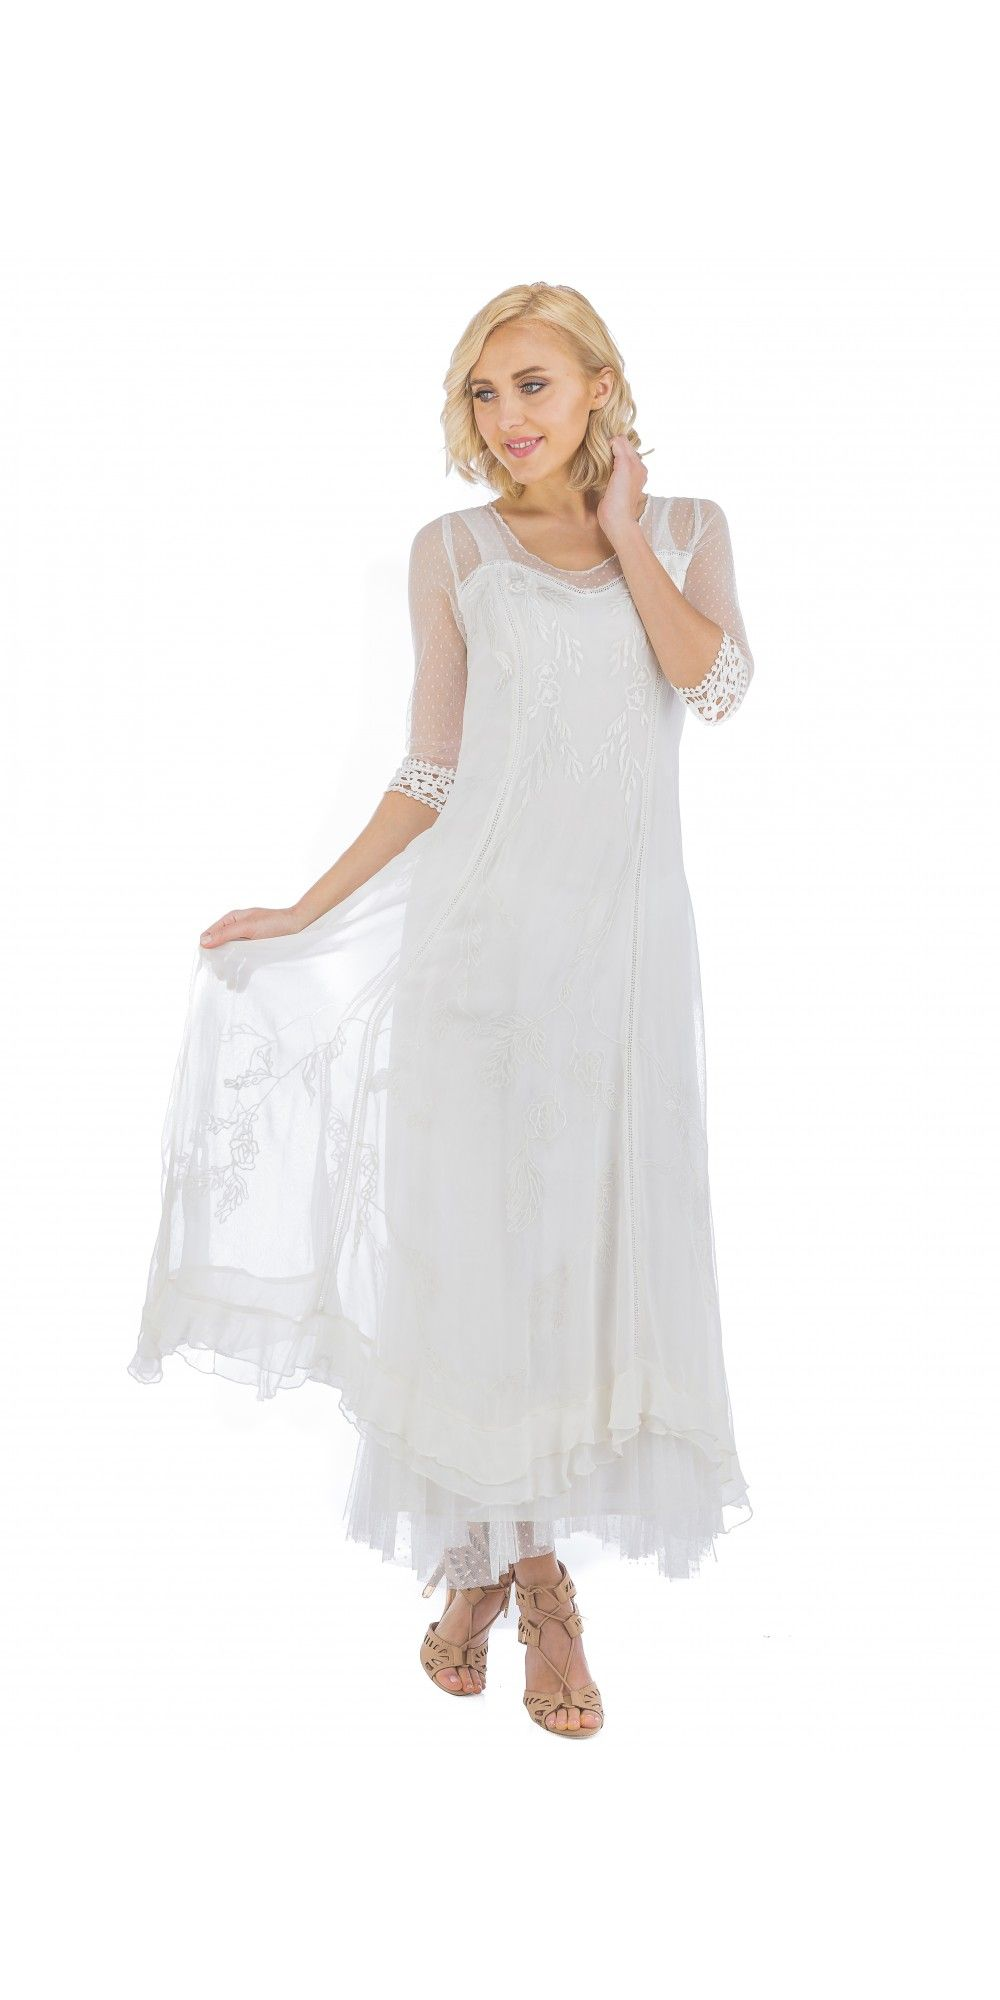 Celine Vintage Style Wedding Gown In Ivory By Nataya Romantic